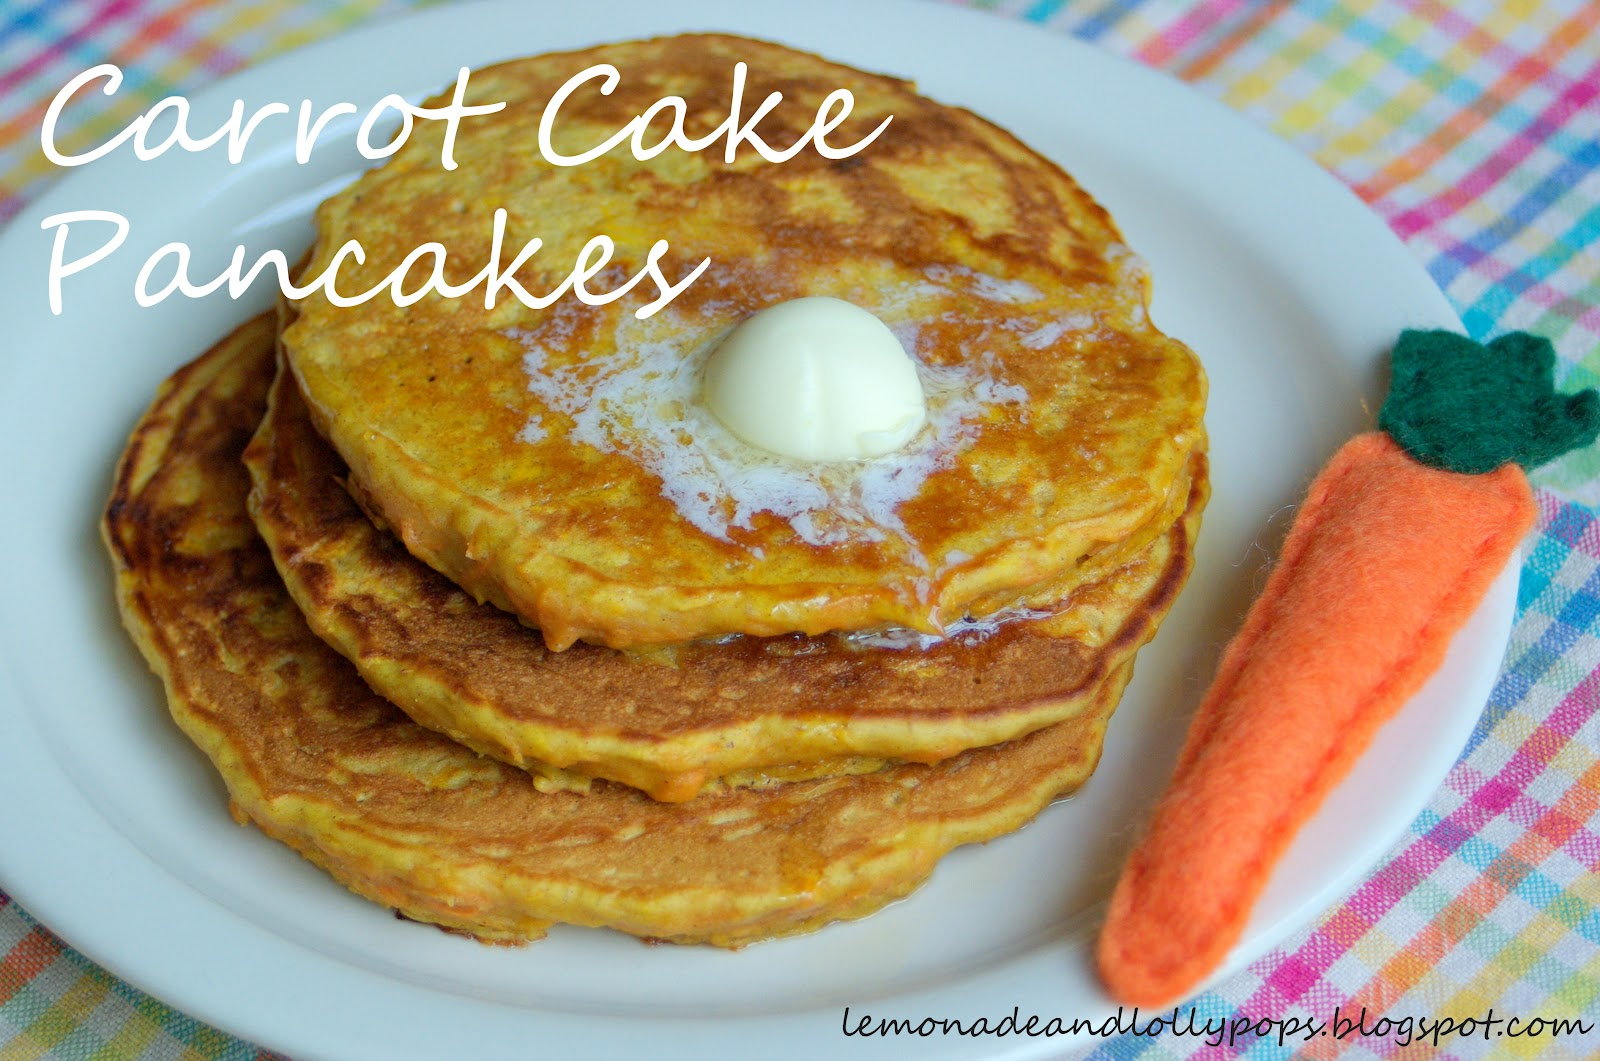 Lemonade and Lollypops: Carrot Cake Pancakes